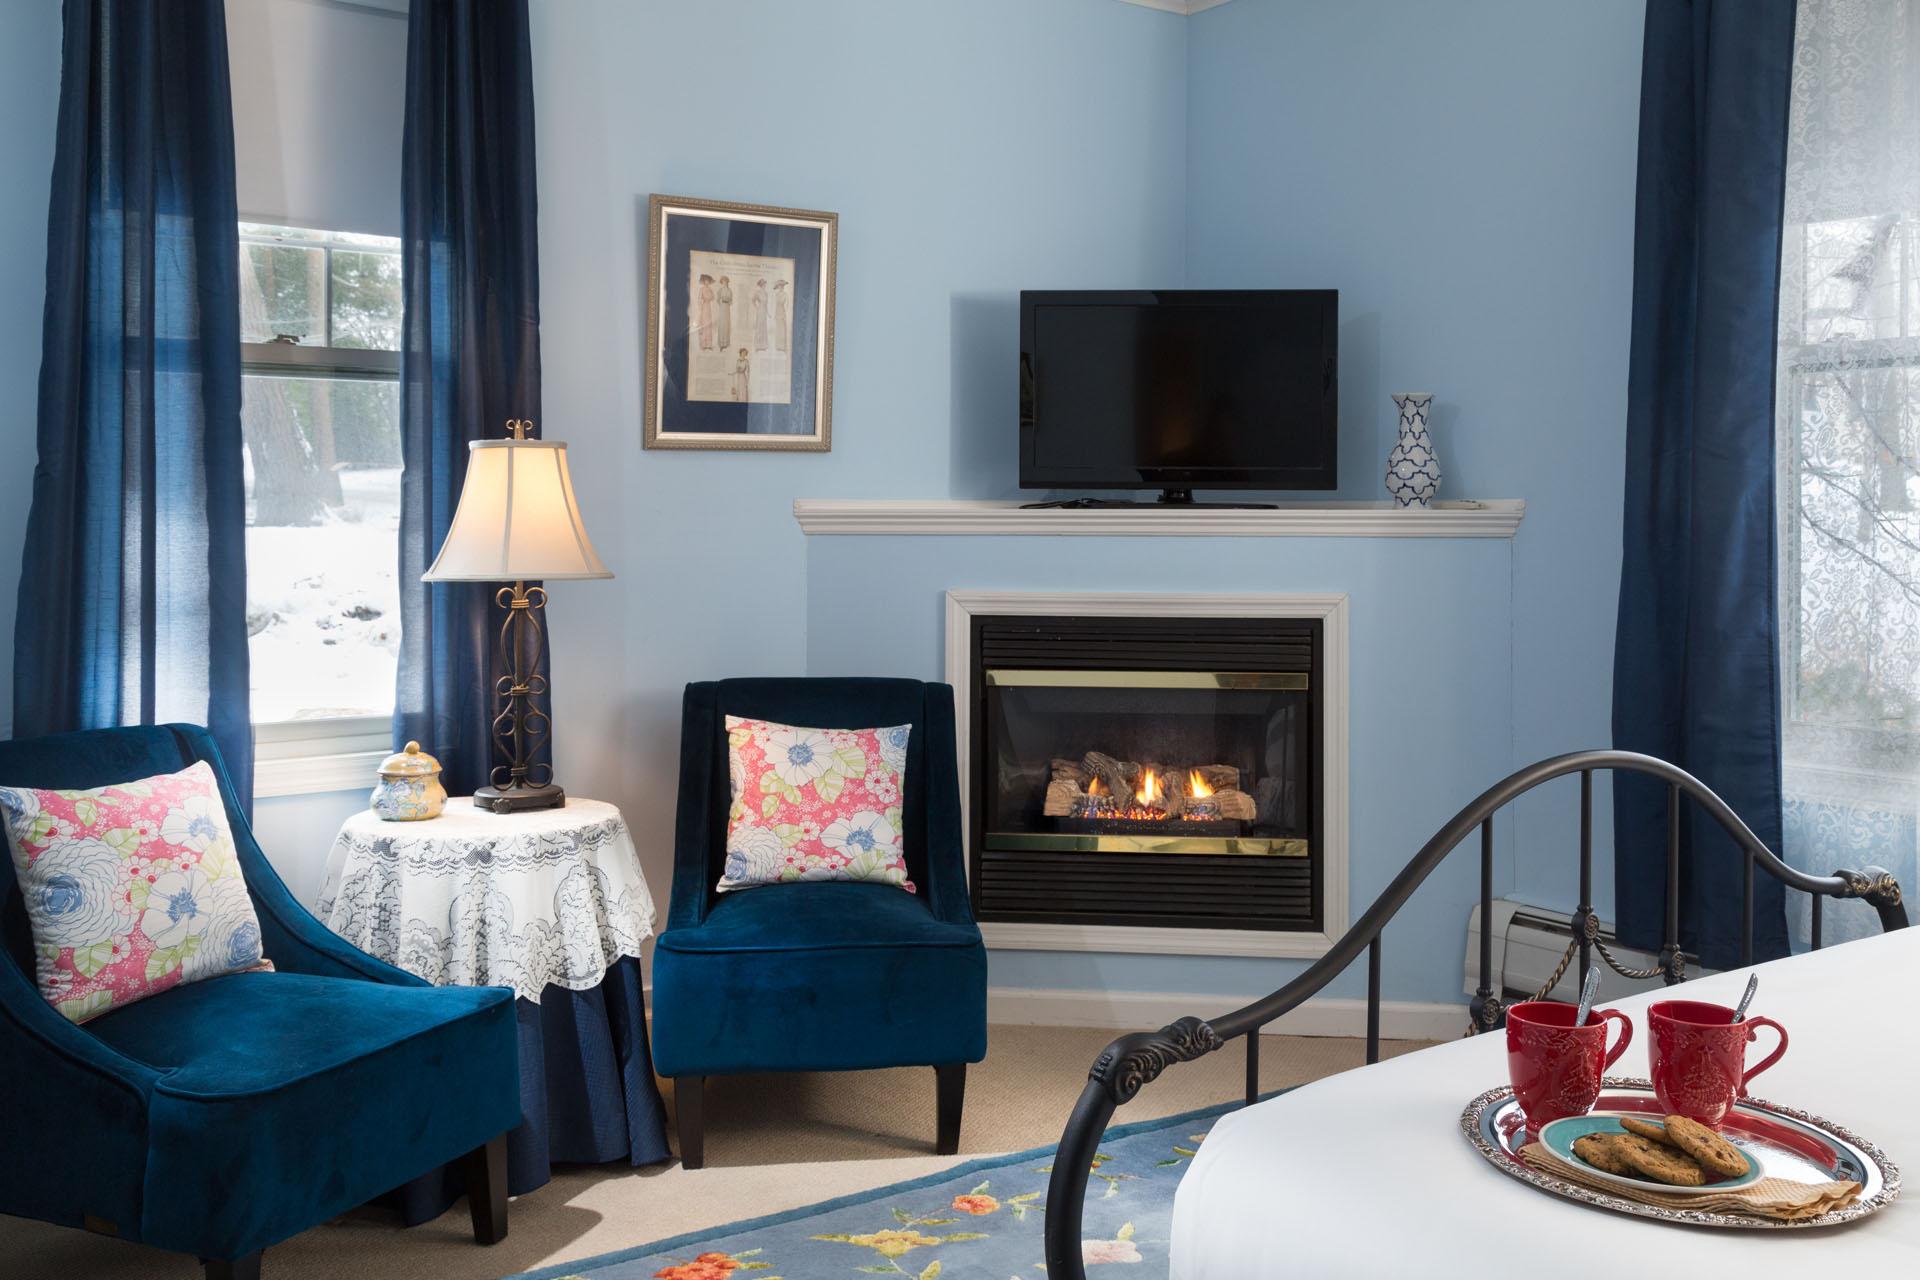 Terrace-Rooms-Maud-